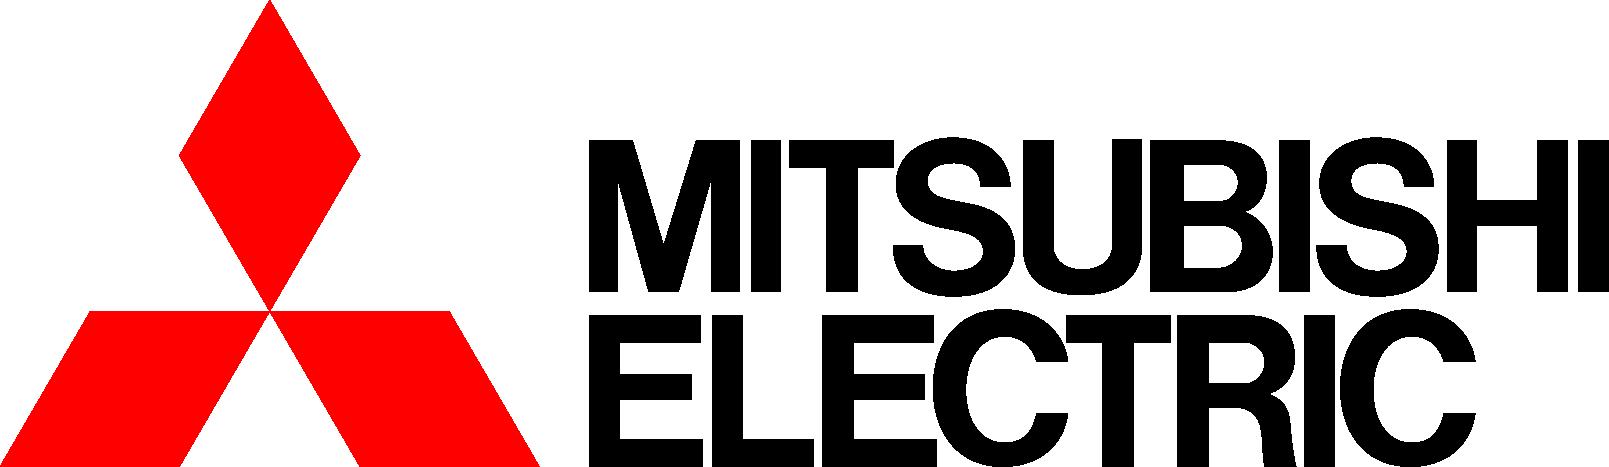 Mitsubishi Electric Logo png